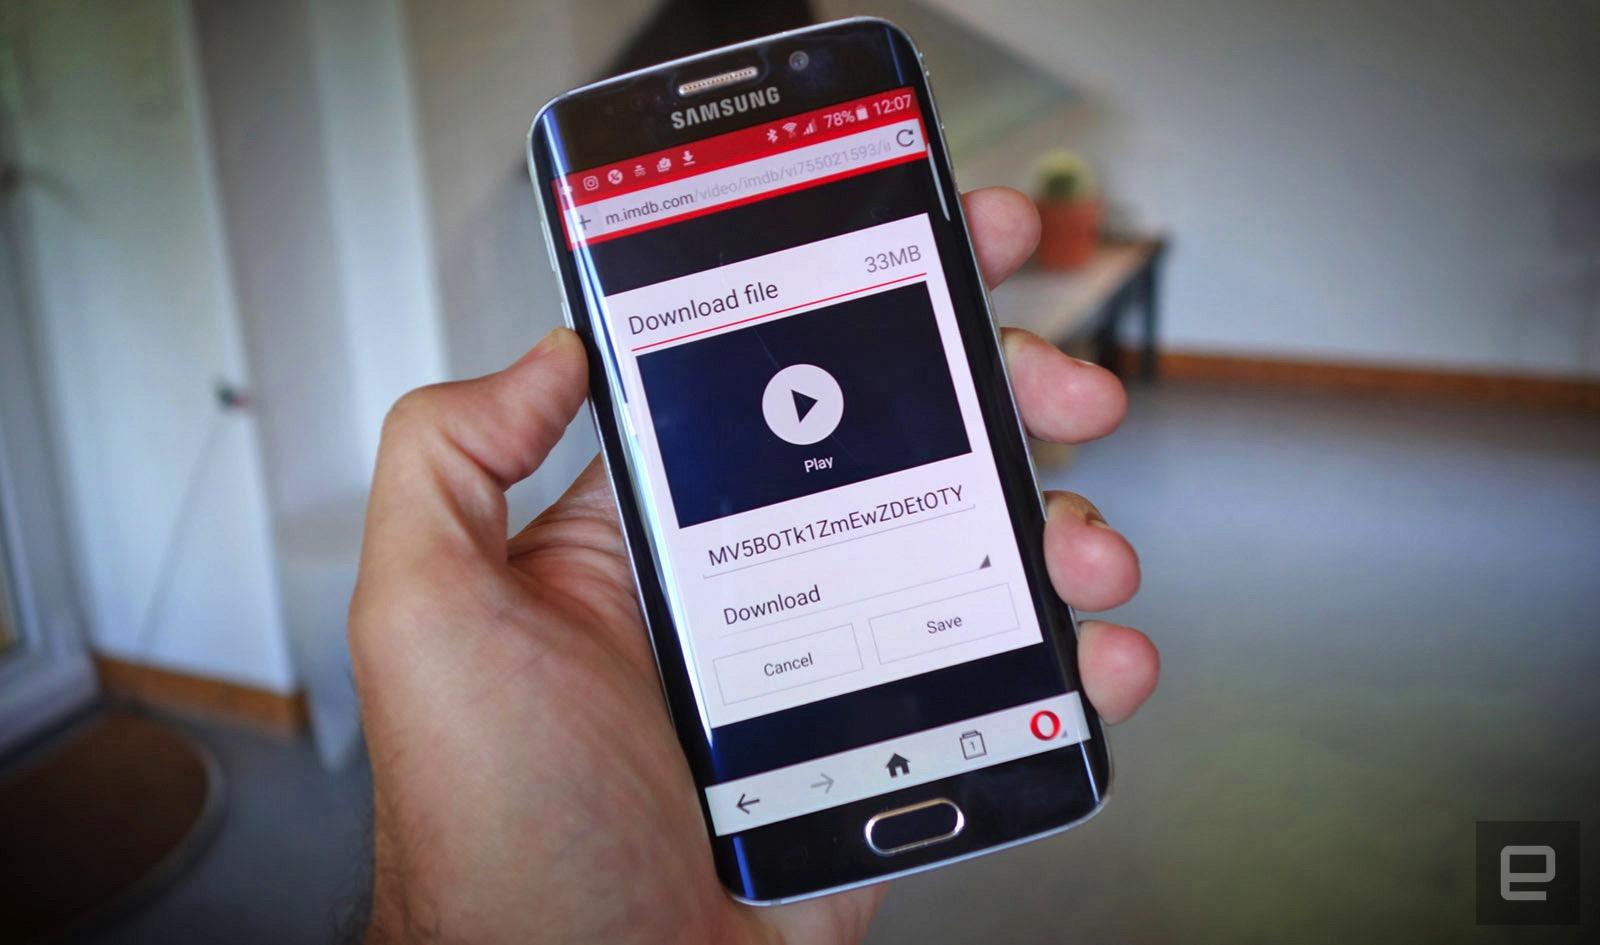 Download opera mini for apple iphone 4s